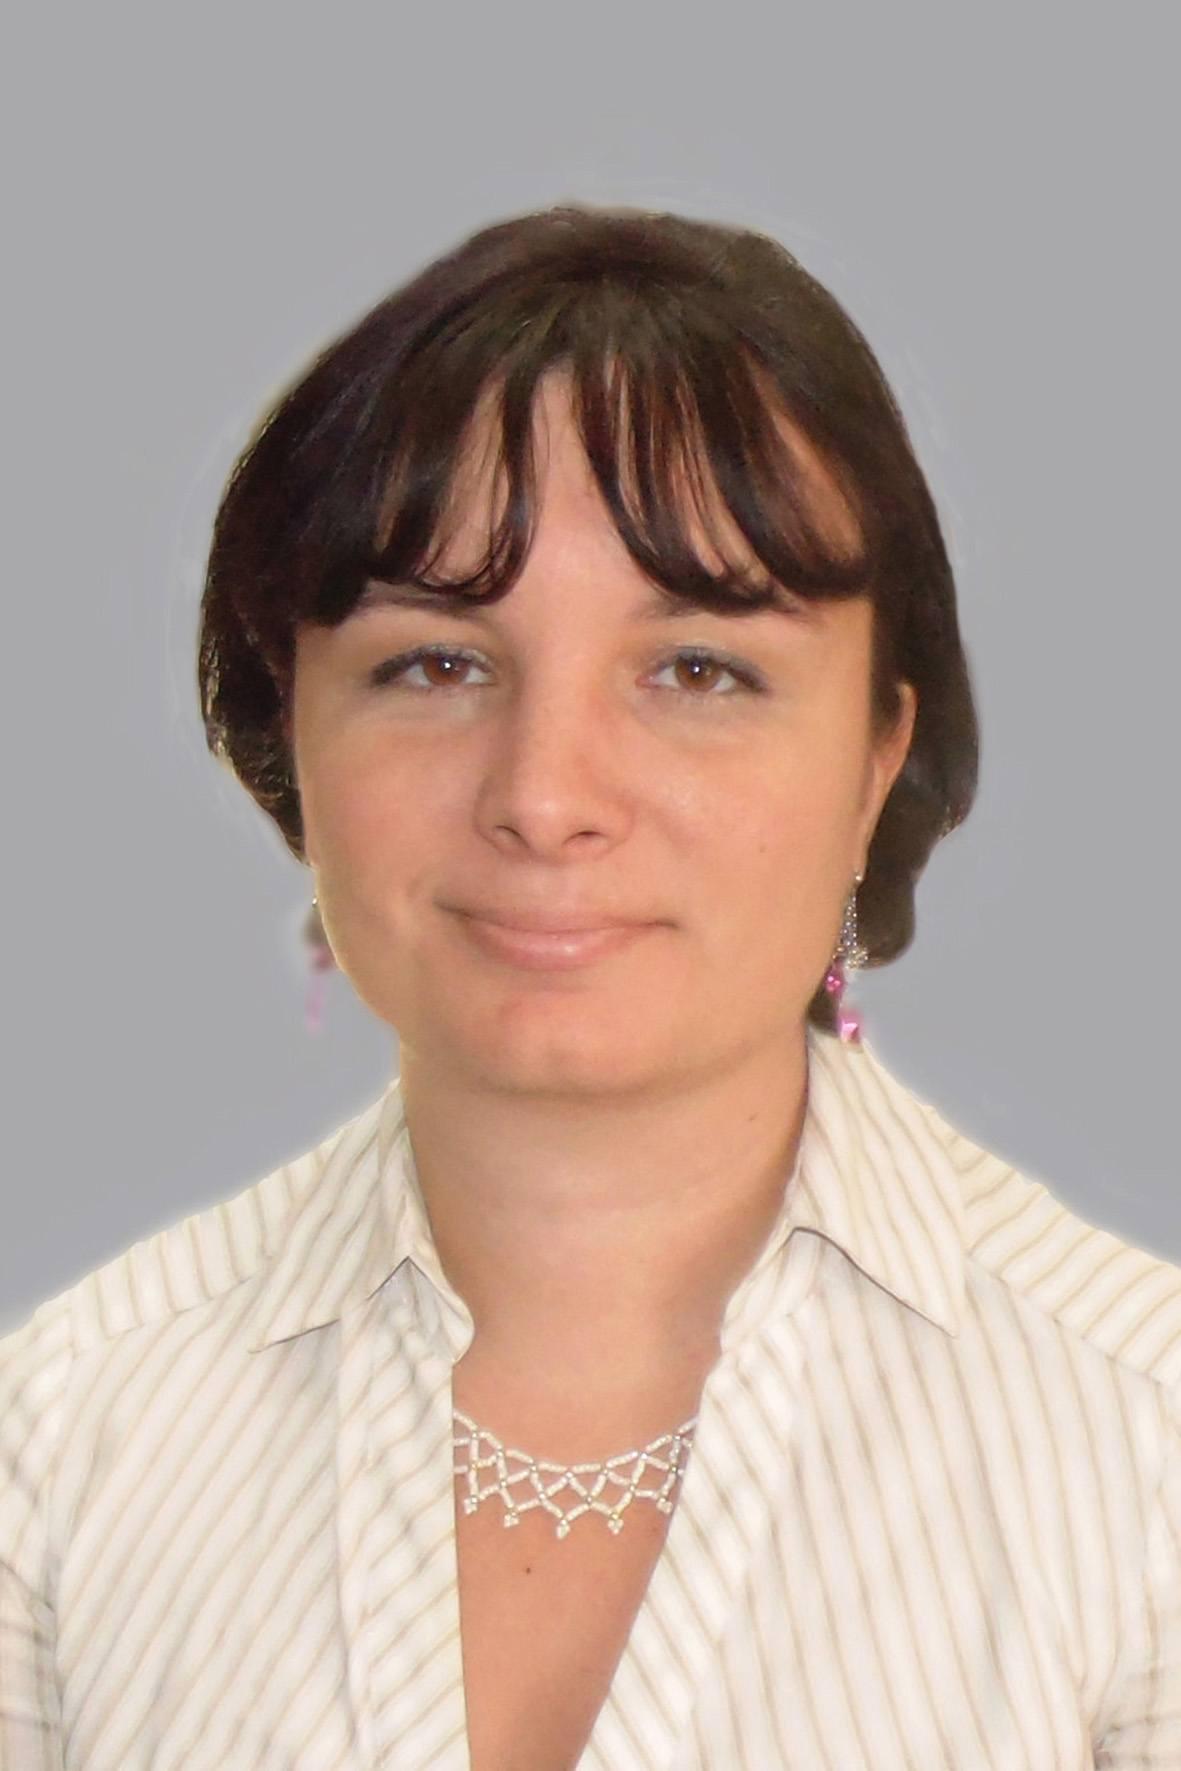 Szabó Lili klinikai szakpszichológus